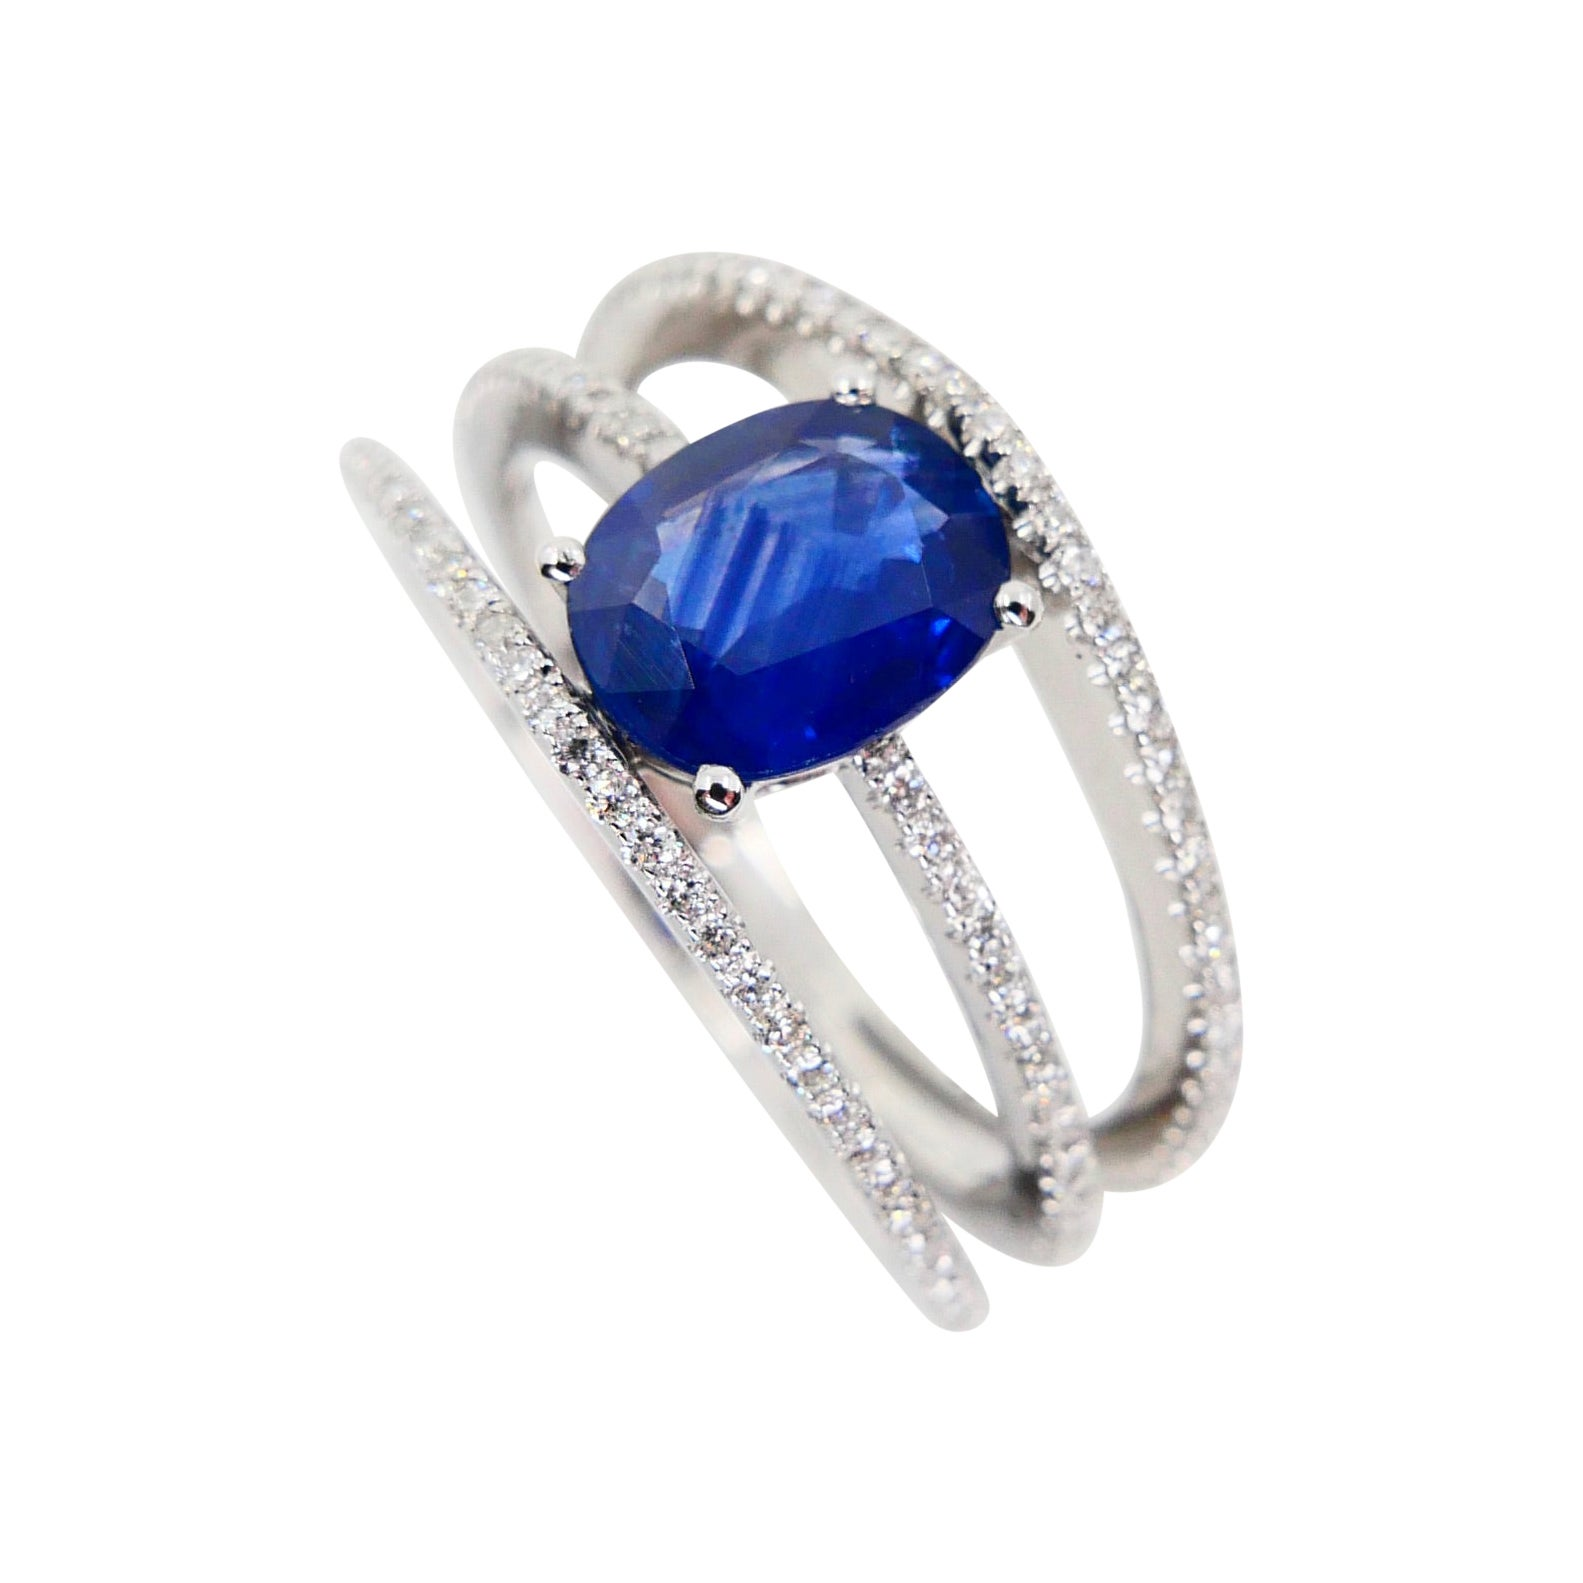 Blue Sapphire and Diamond Cocktail Ring, 3 Rows Design, 18 Karat White Gold